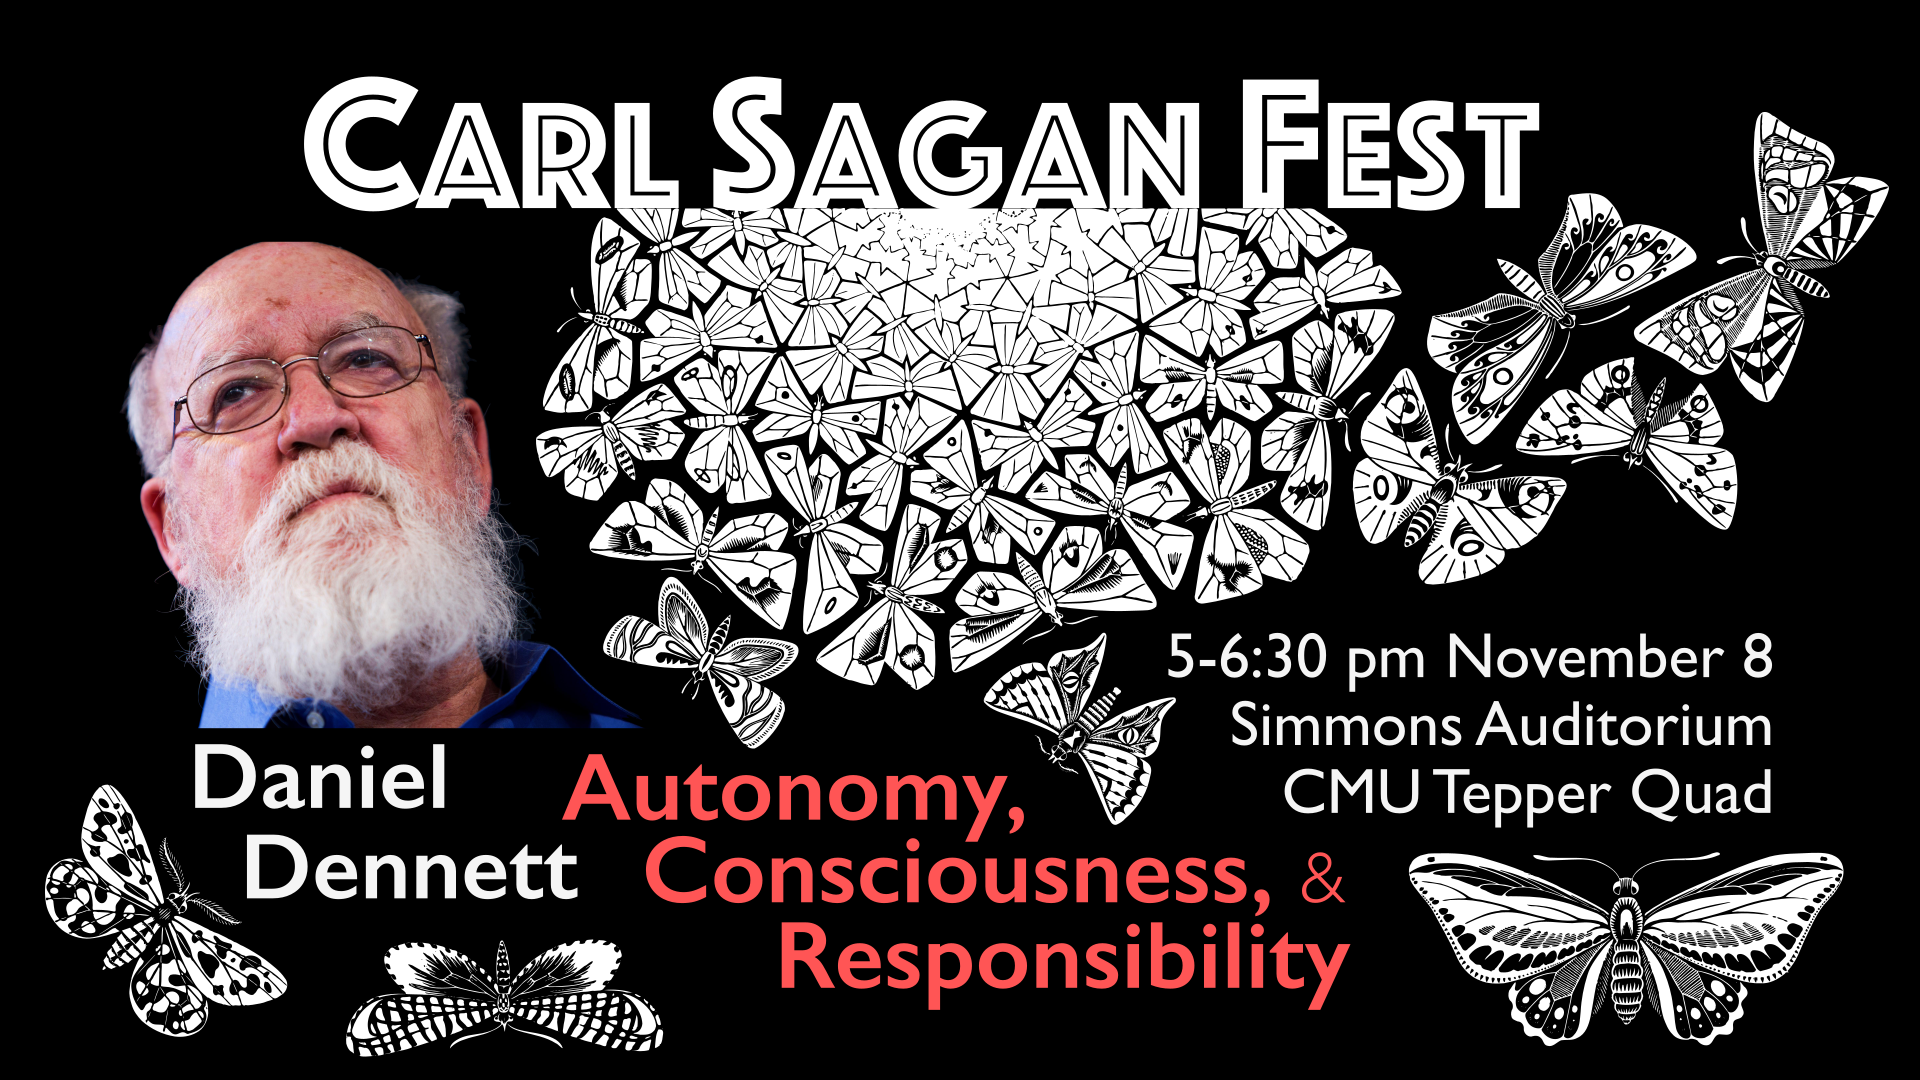 Carl Sagan Fest, featuring Daniel Dennett Banner